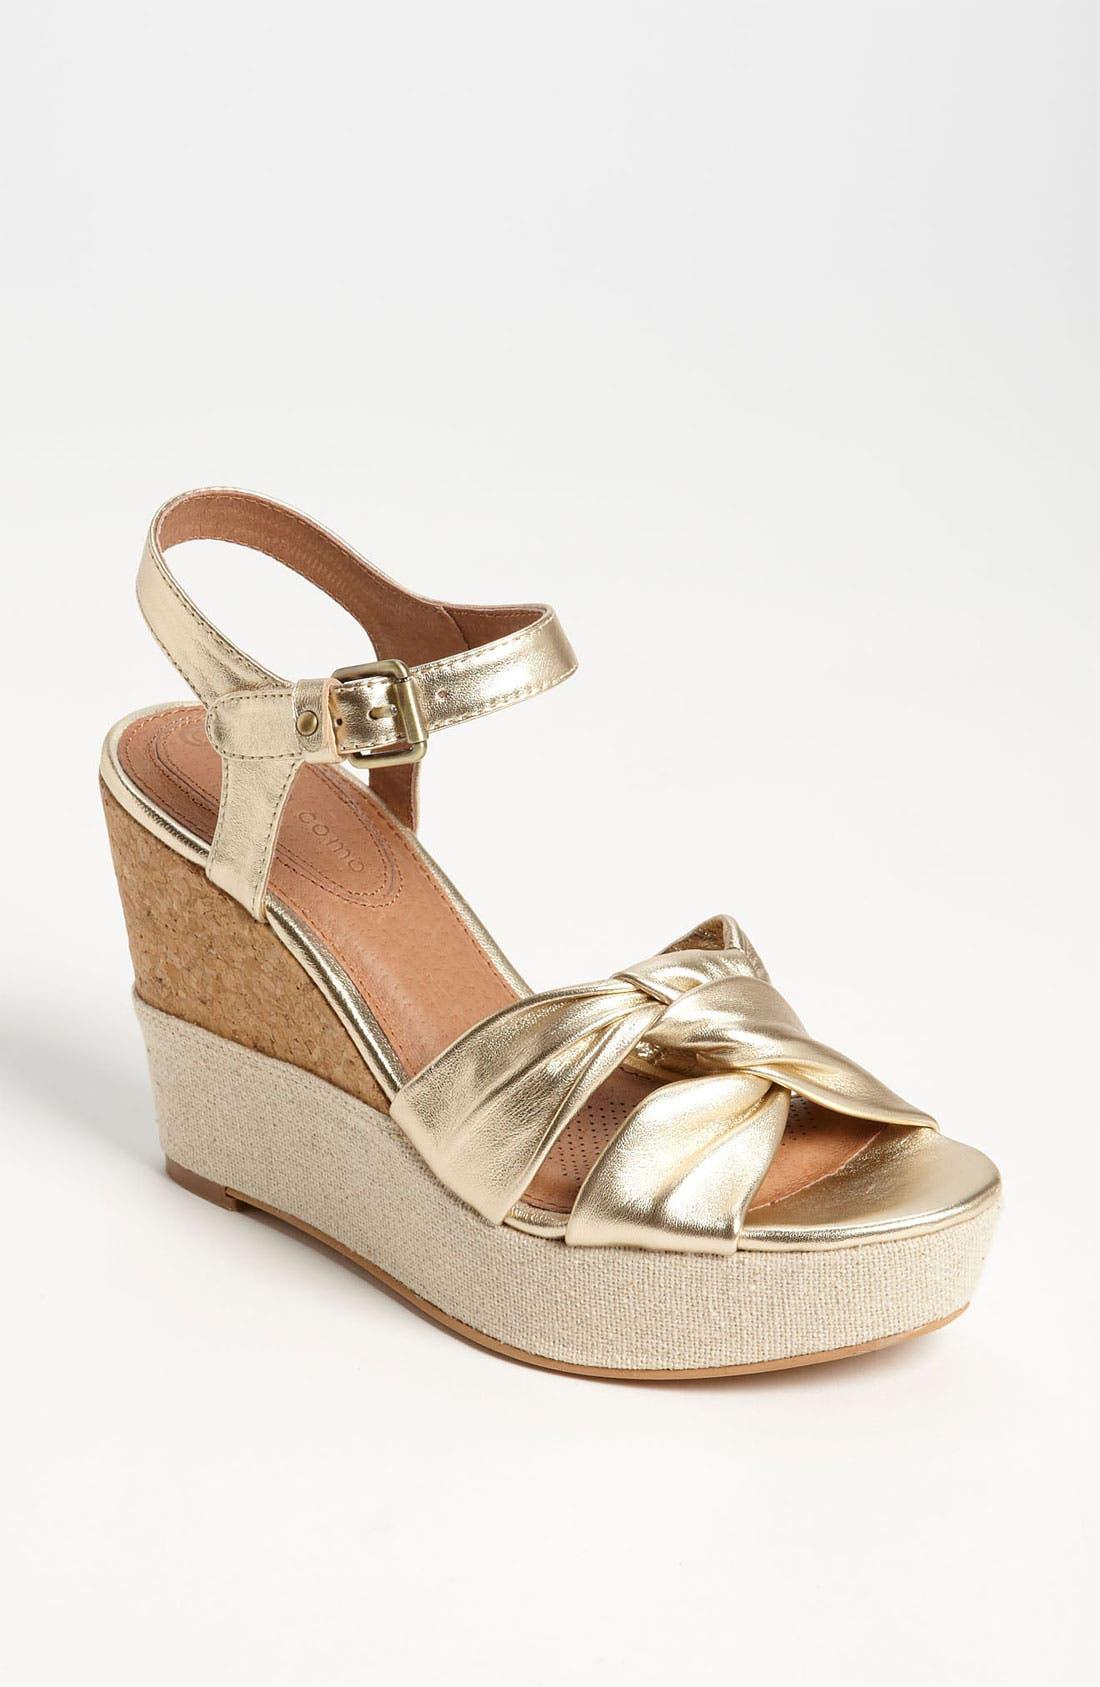 Main Image - Corso Como 'Nani' Sandal